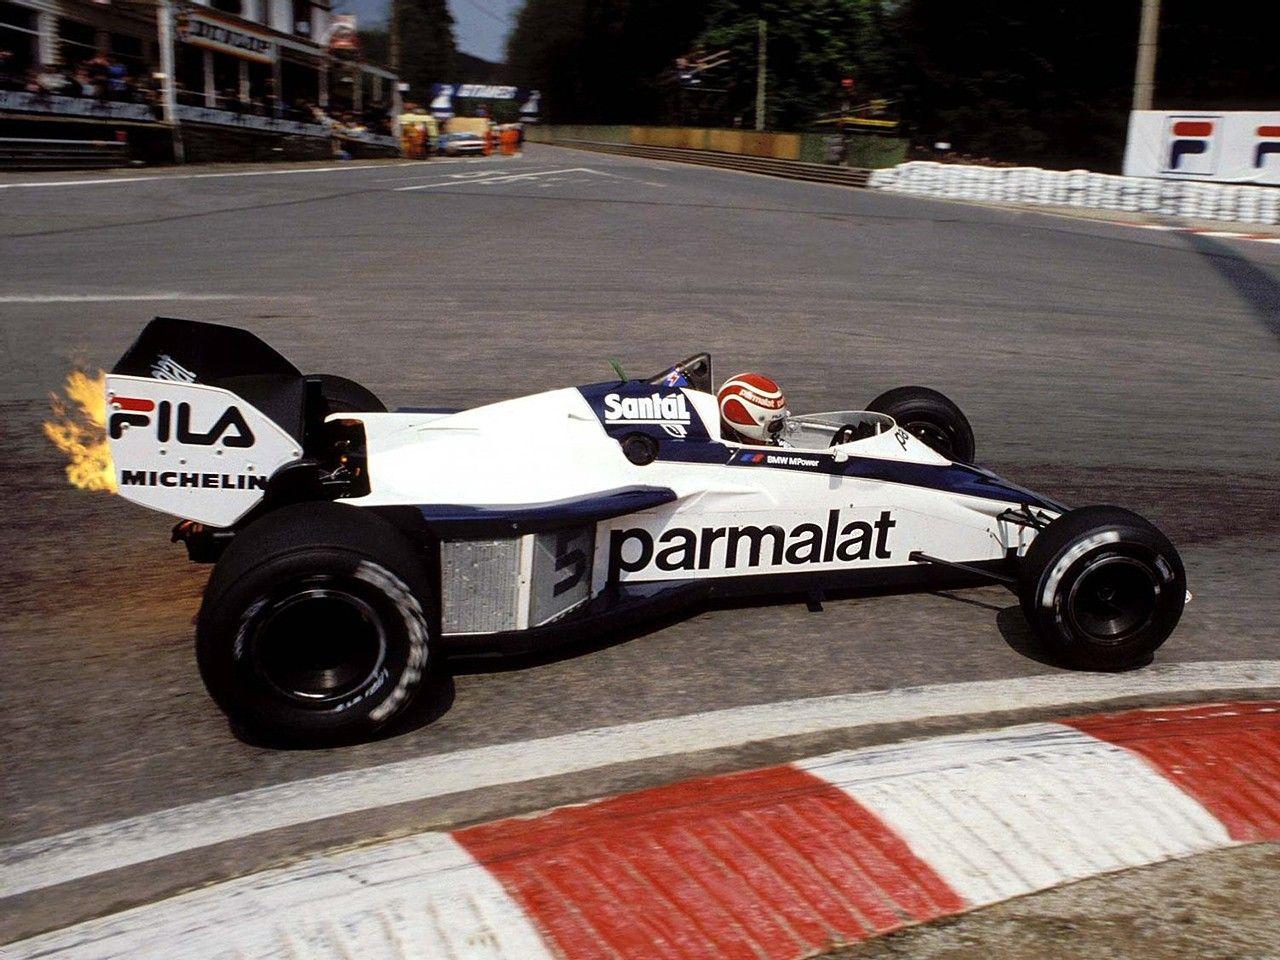 Brabham Formula1 car | BMW Brabham BT52 Wallpapers | Car wallpapers ...